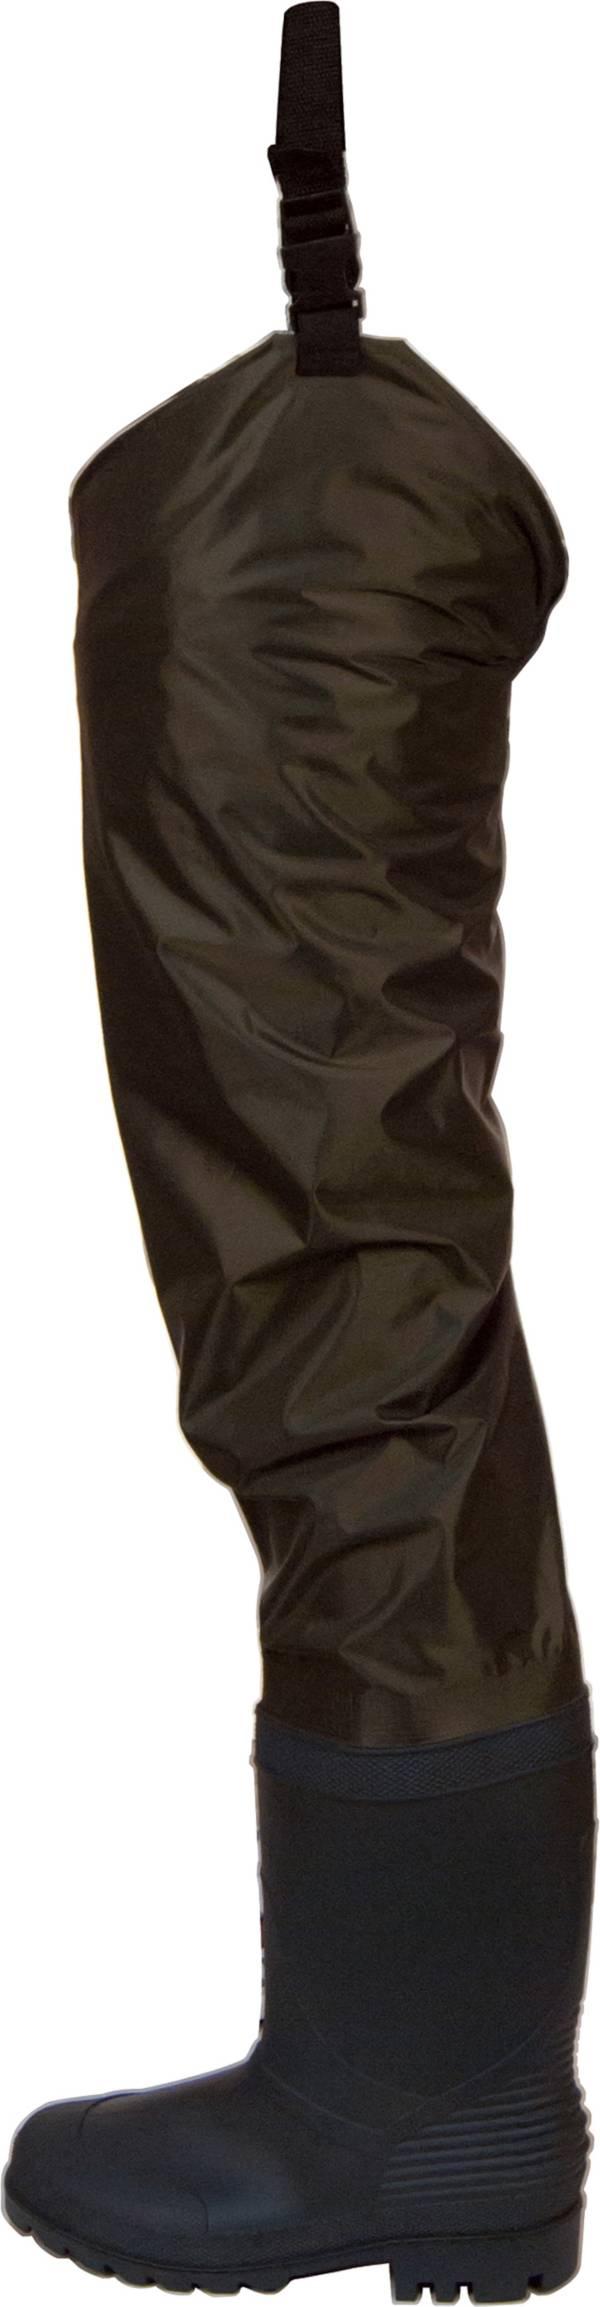 frogg toggs Rana II PVC Hip Waders product image